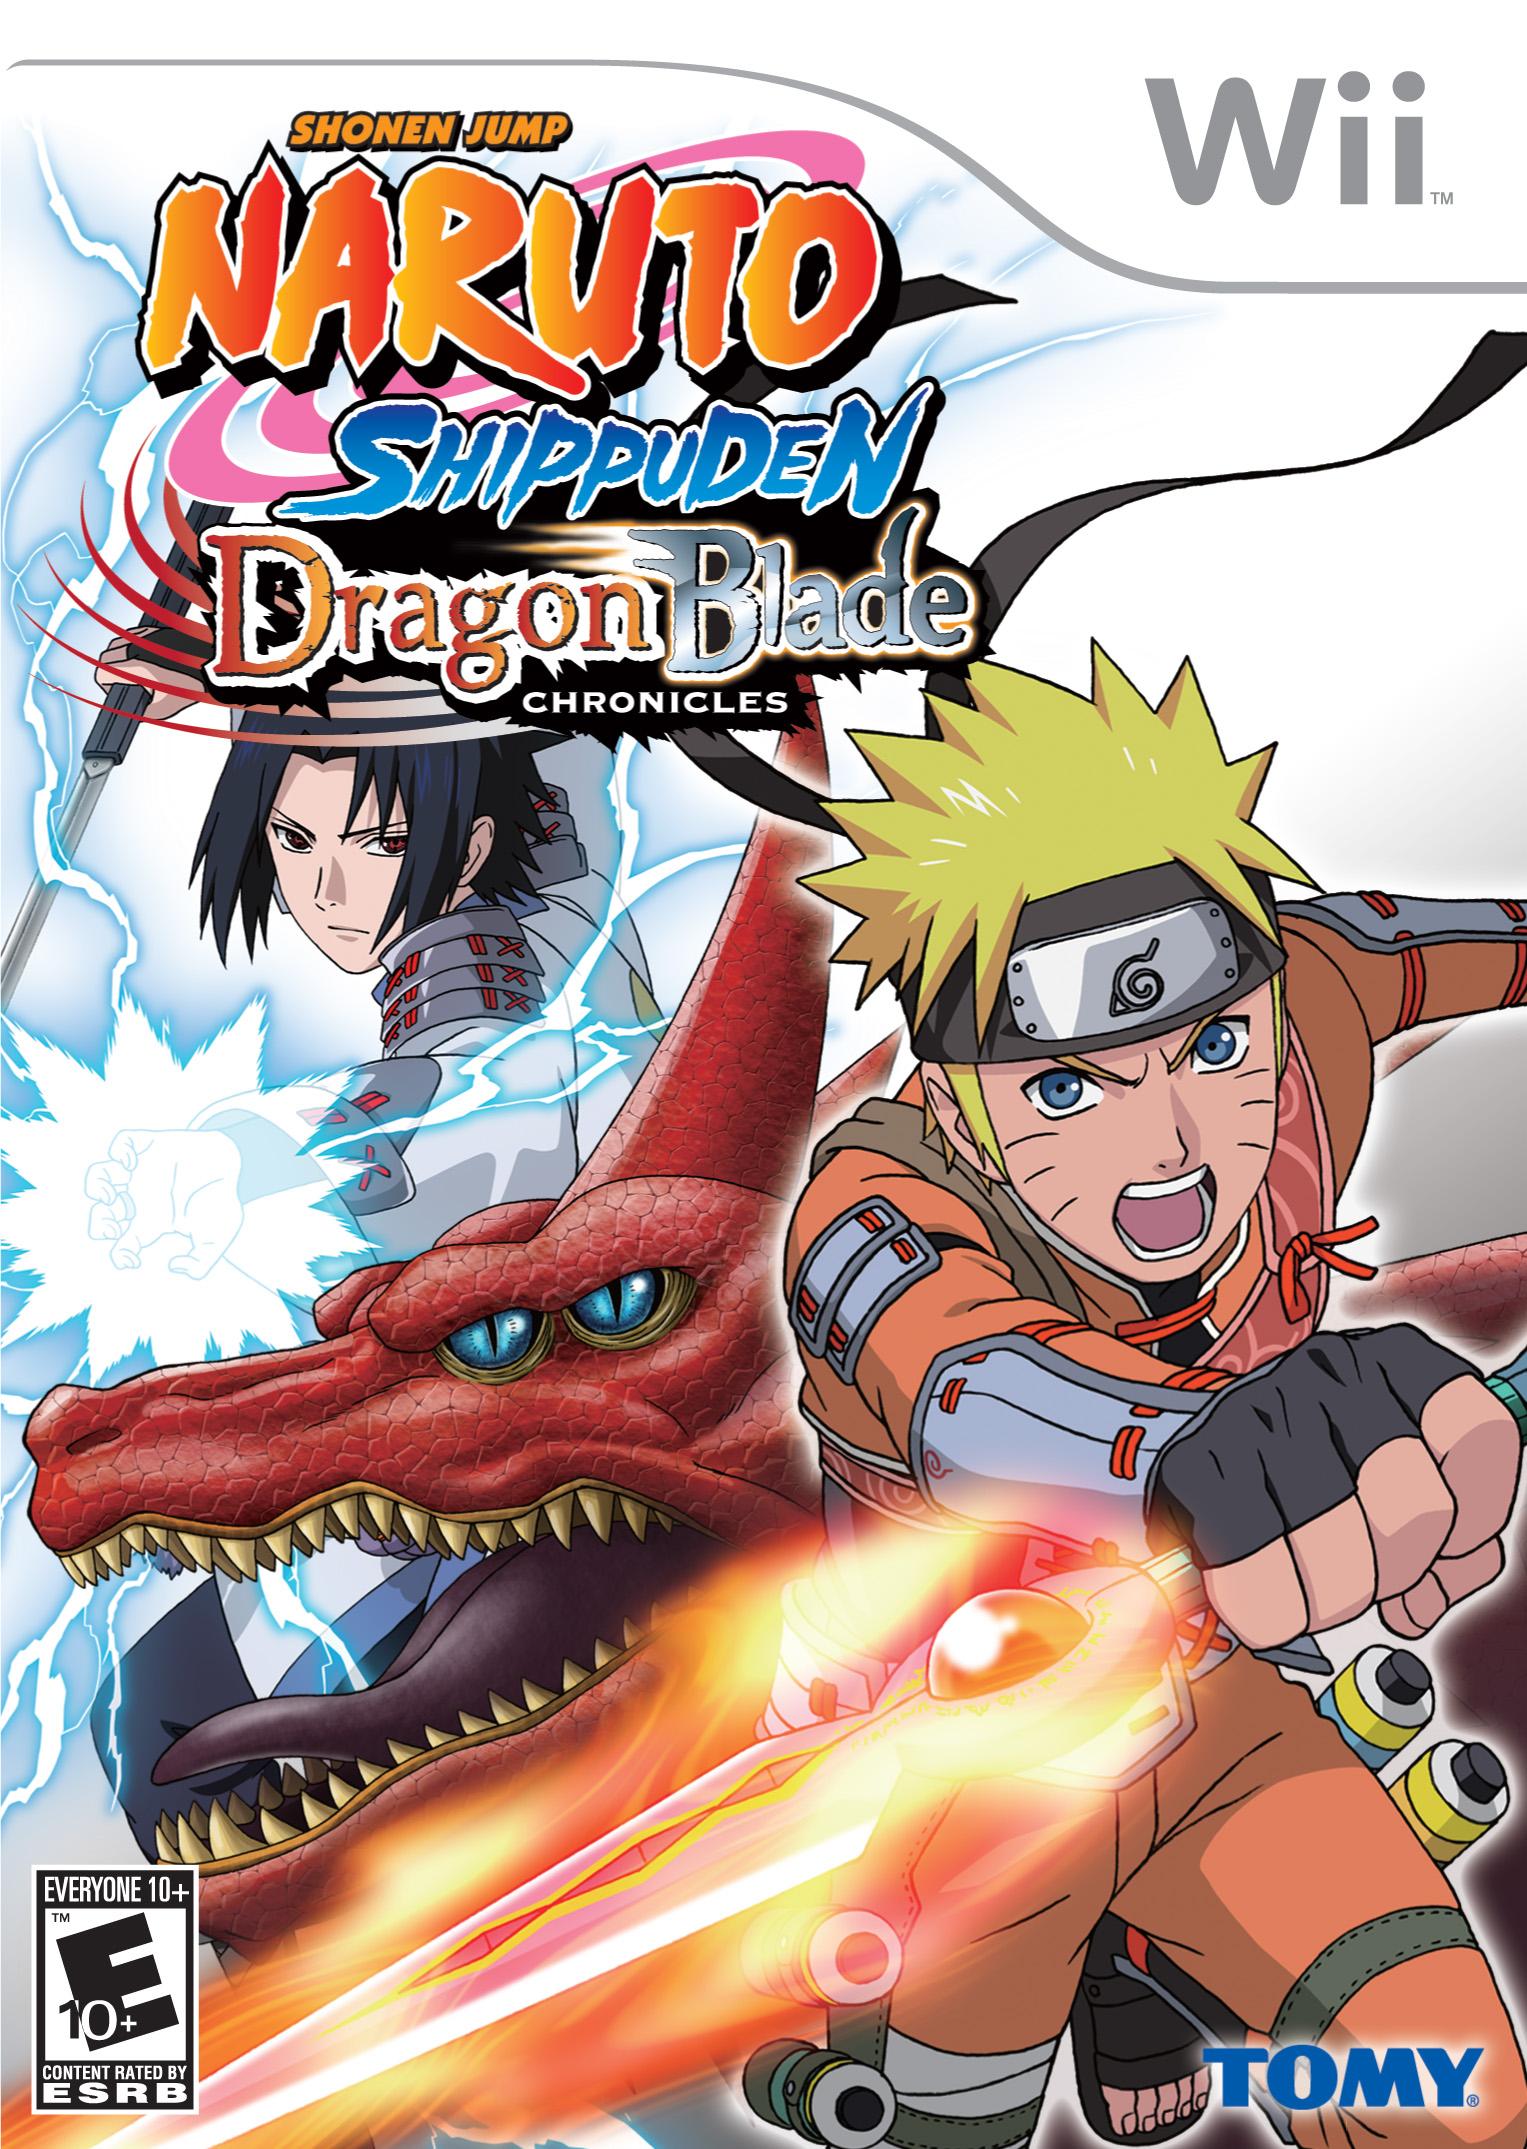 naruto shippūden: dragon blade chronicles | narutopedia | fandom